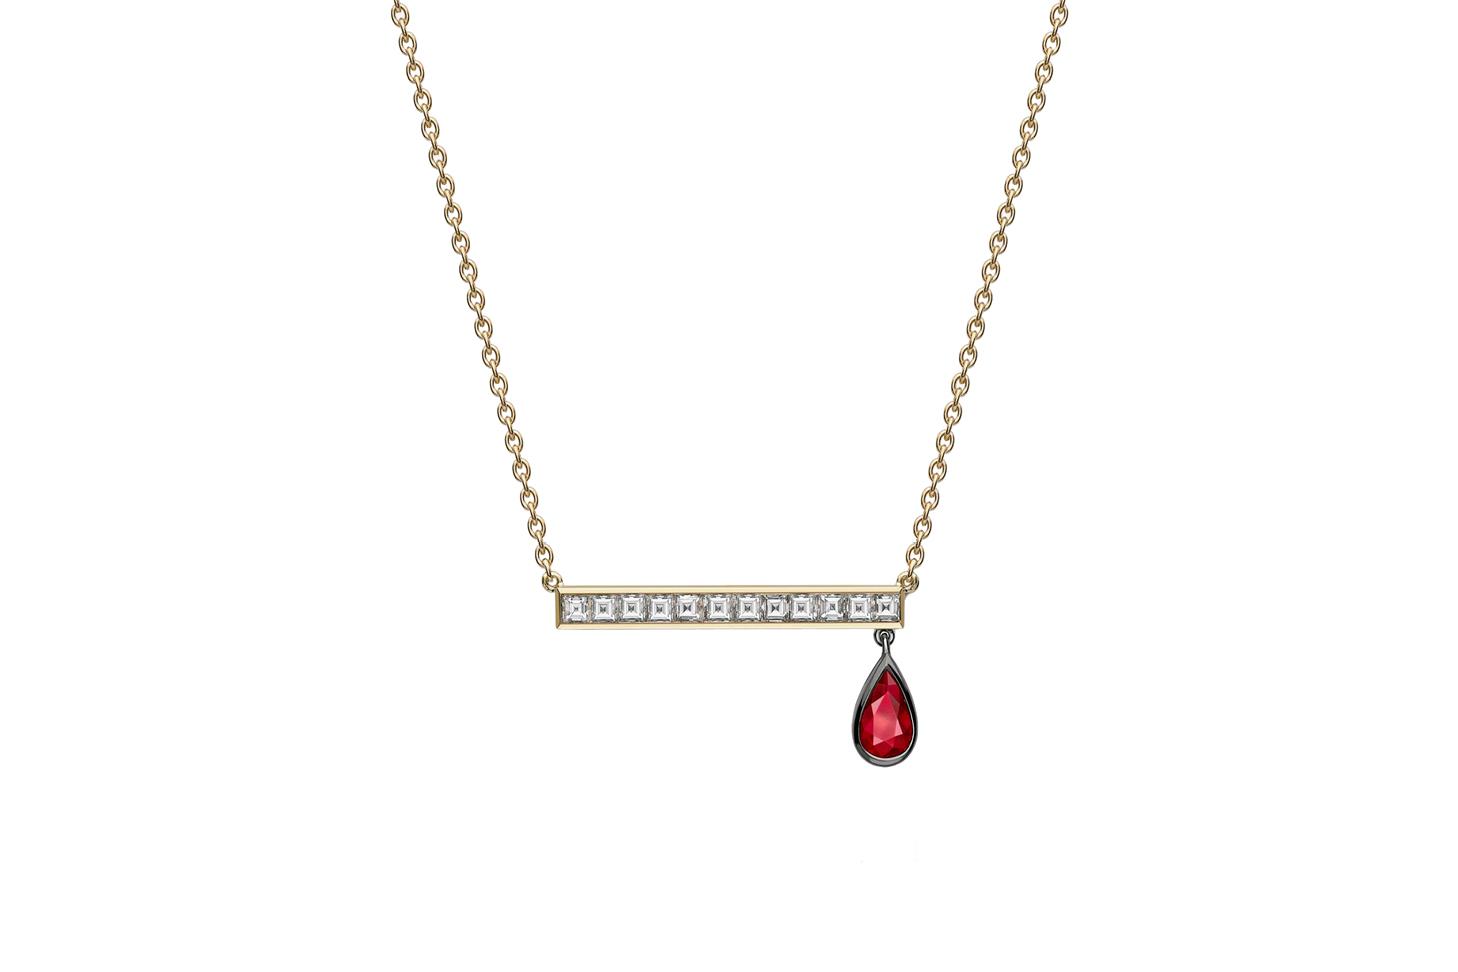 Jessica McCormack Strike Diamond & Ruby Pendant